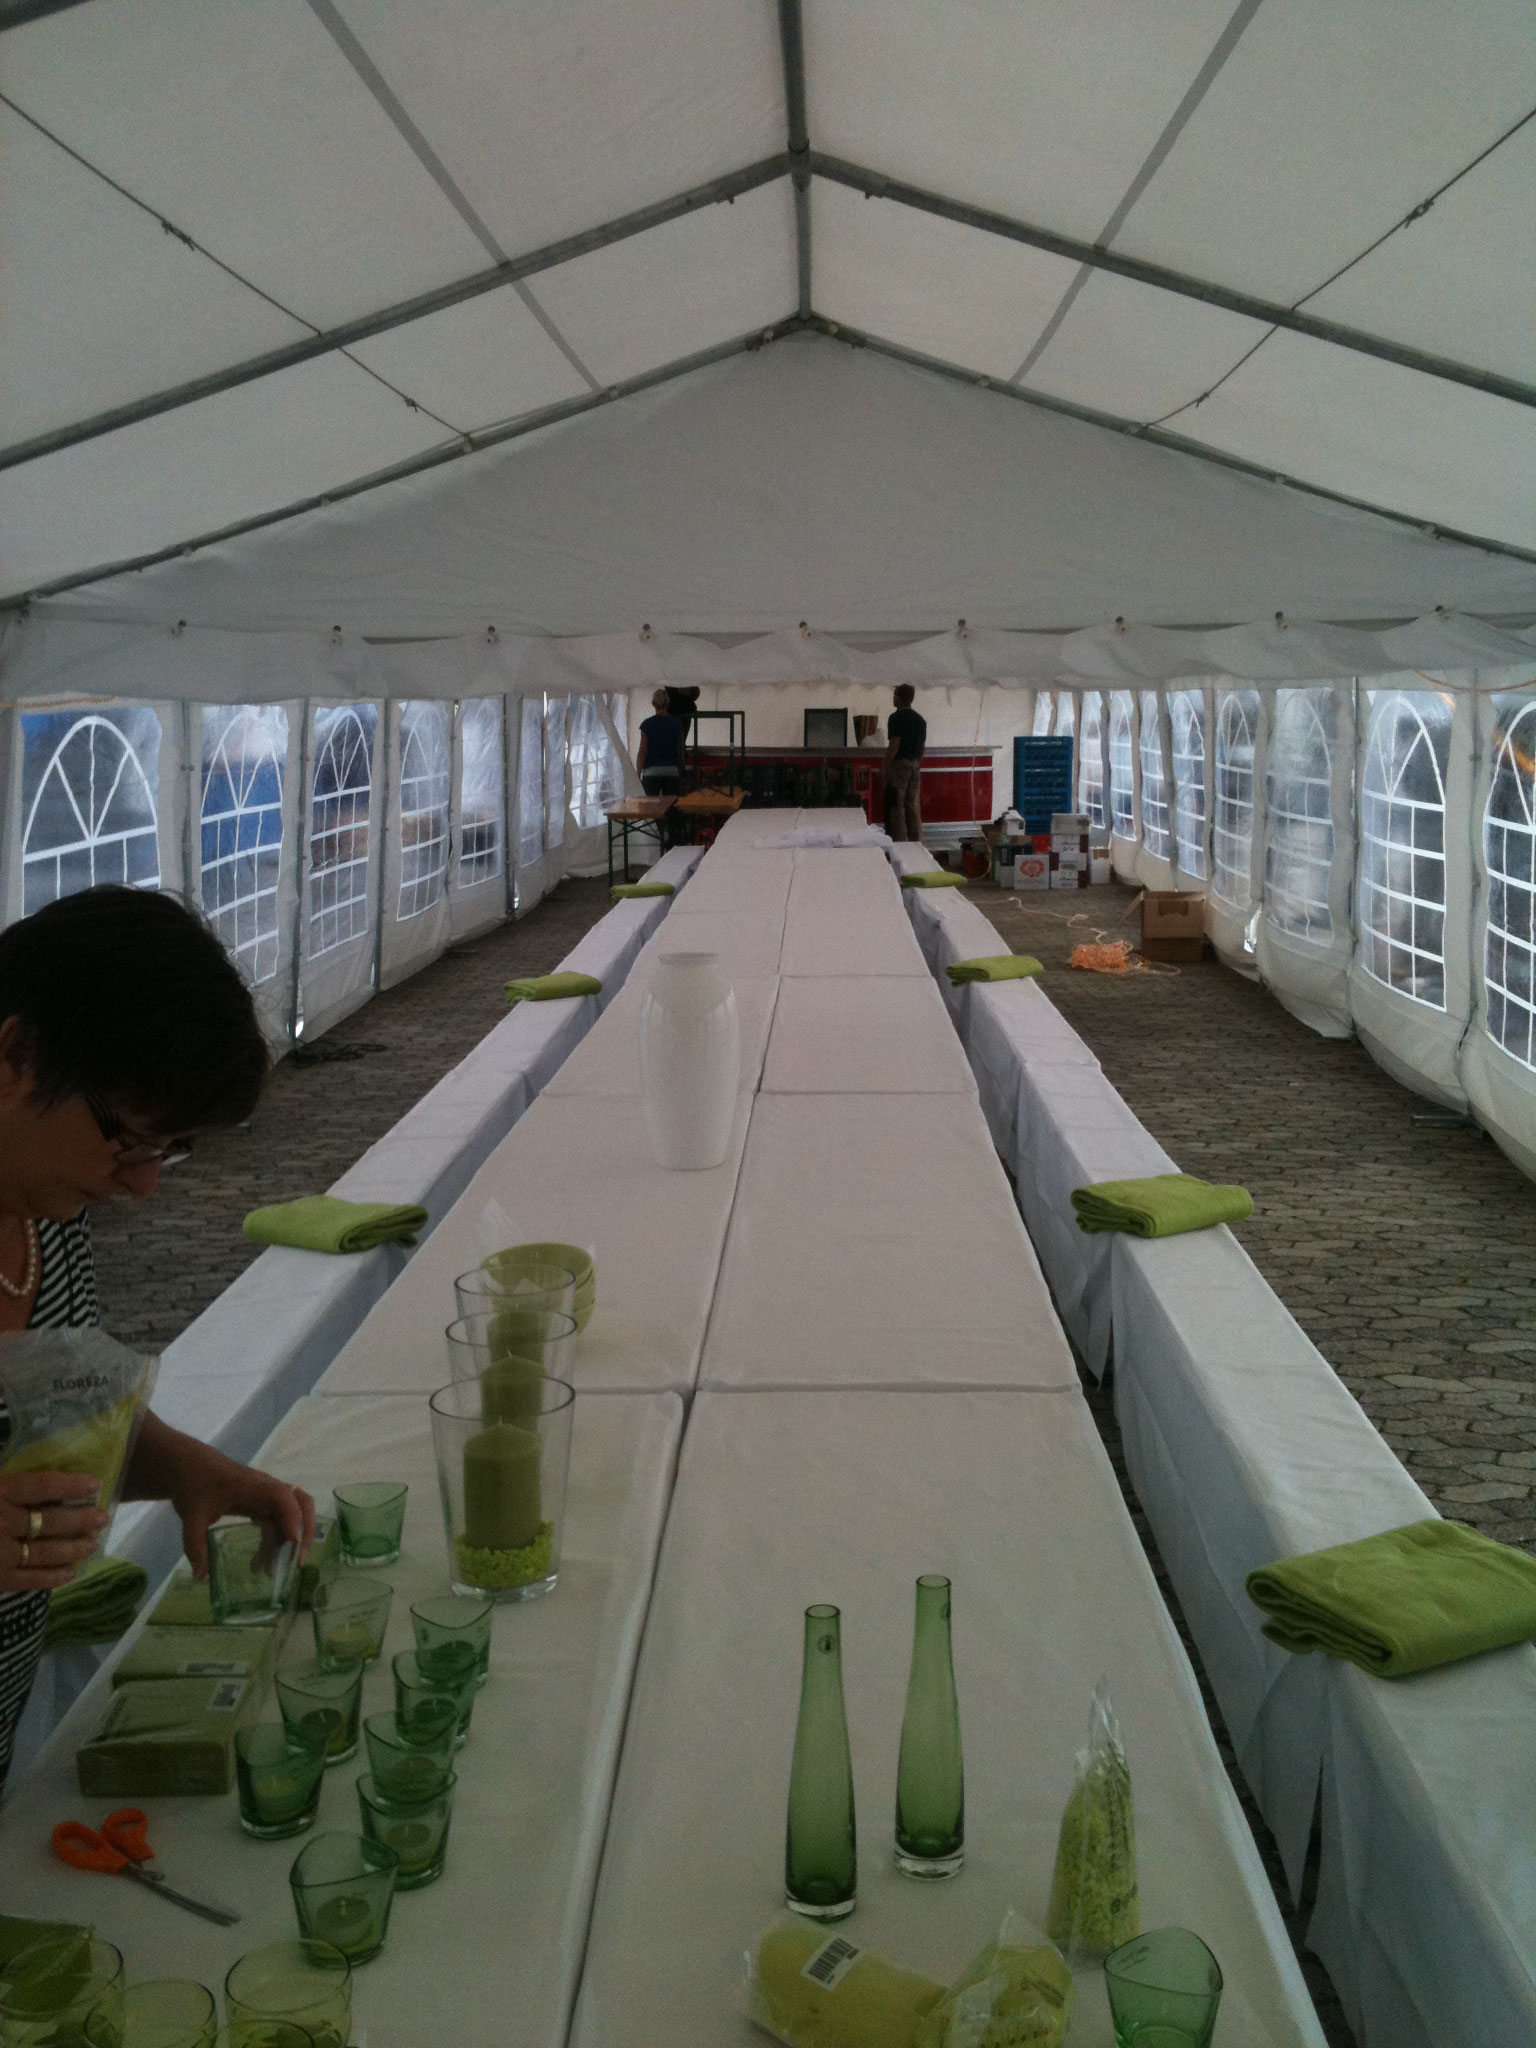 Tisch XXL Tafel mieten in Kiel